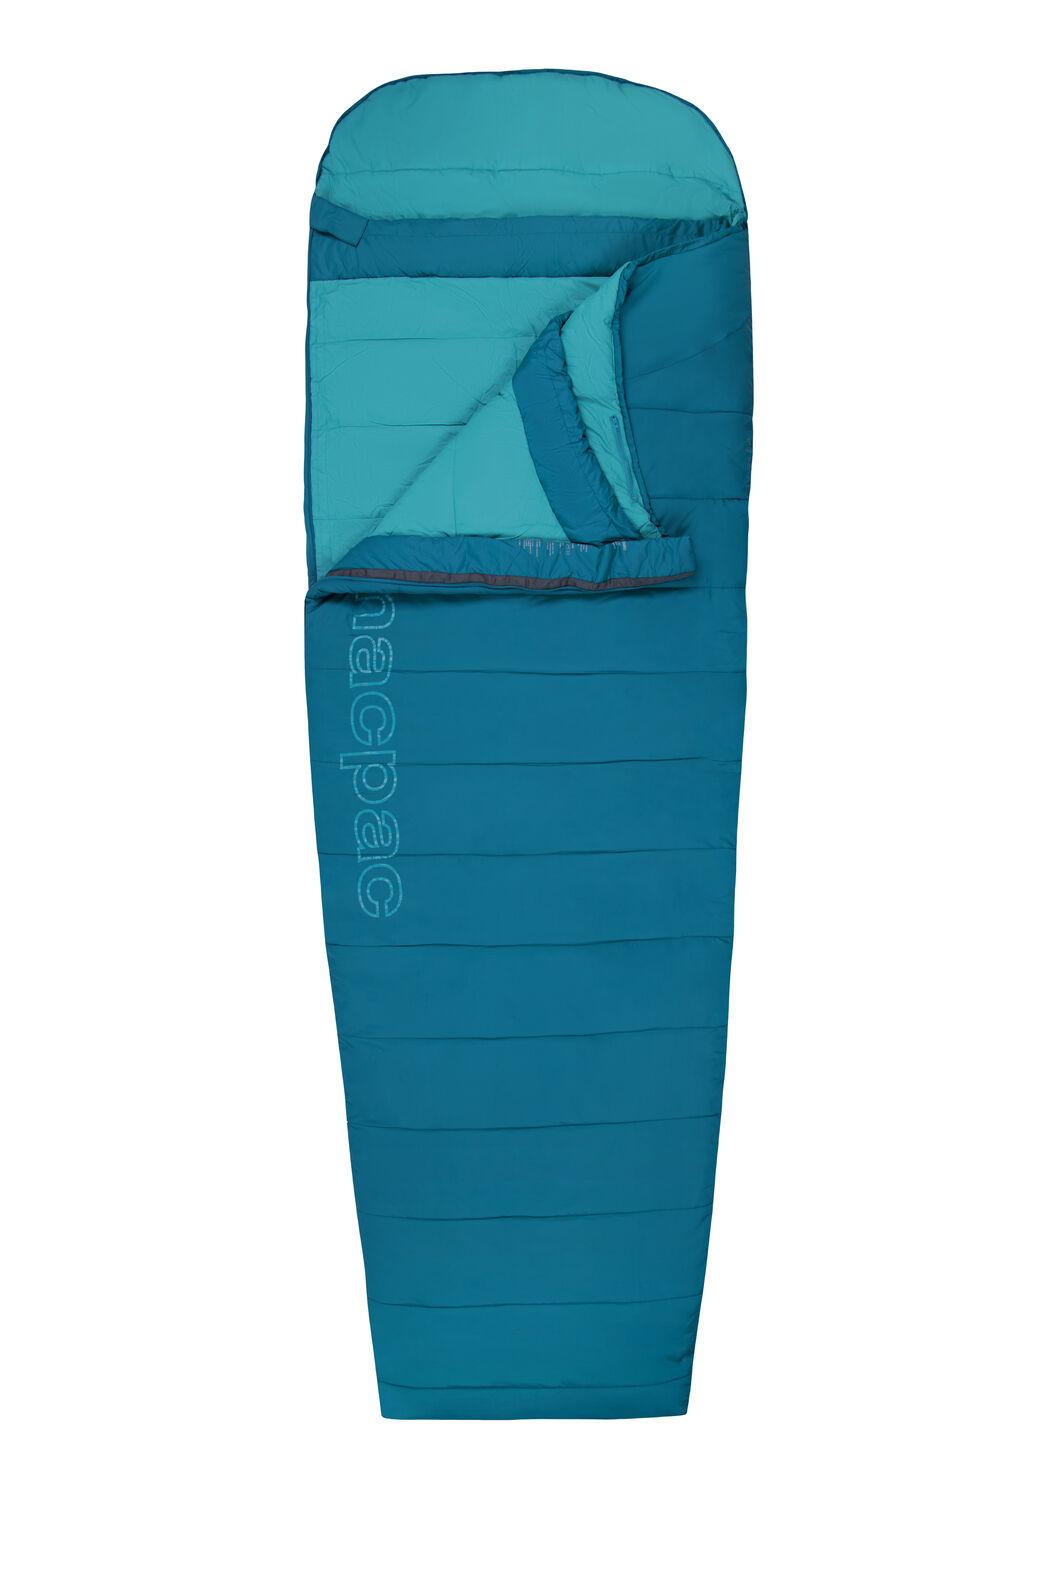 Macpac Roam 200 Sleeping Bag — Standard, Morrocan Blue/Larkspur, hi-res